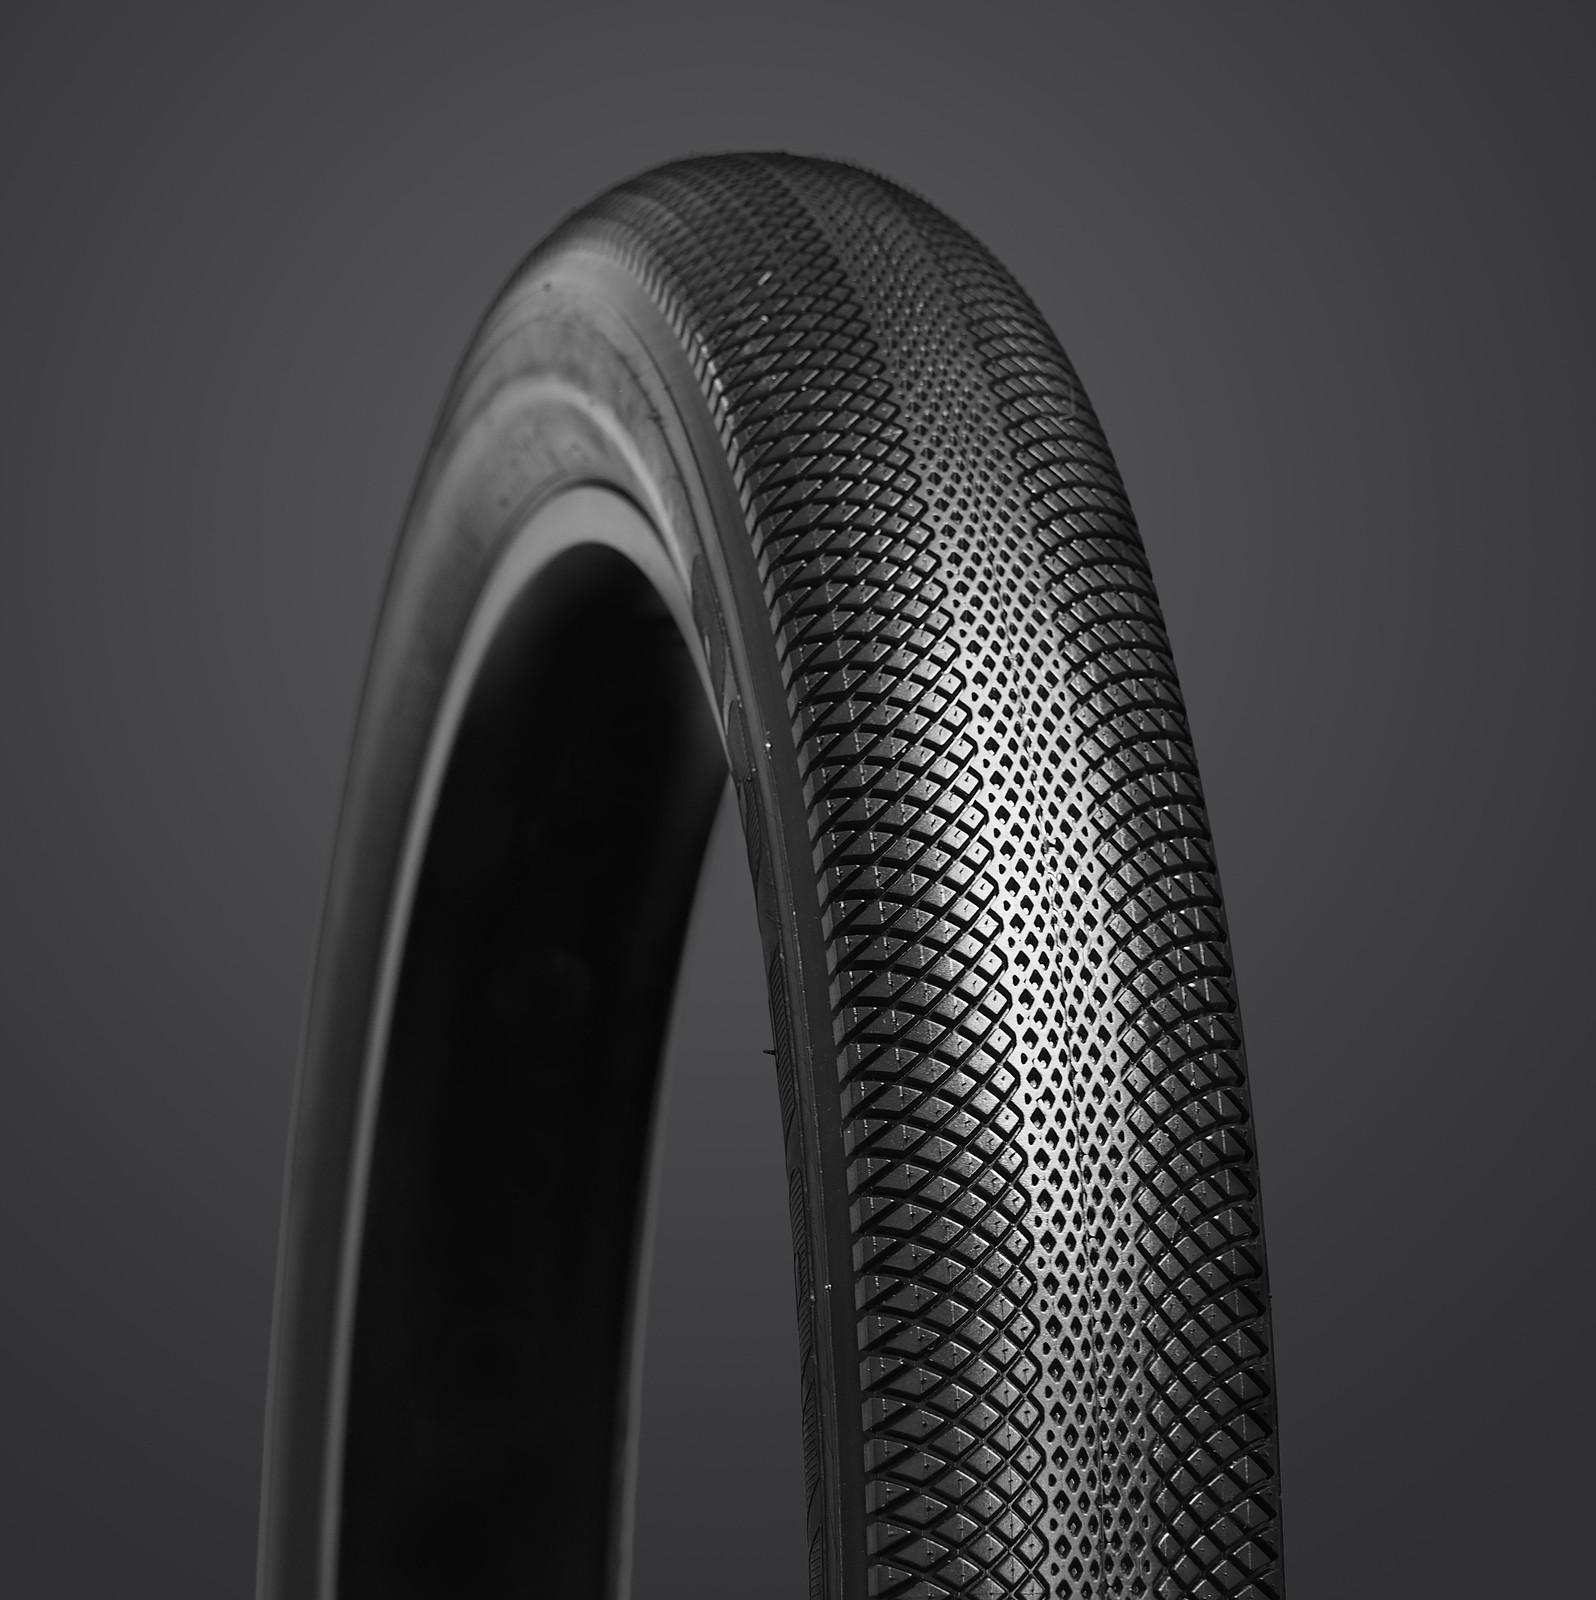 Vee Tire Co Speedster 29 Tire Reviews Comparisons